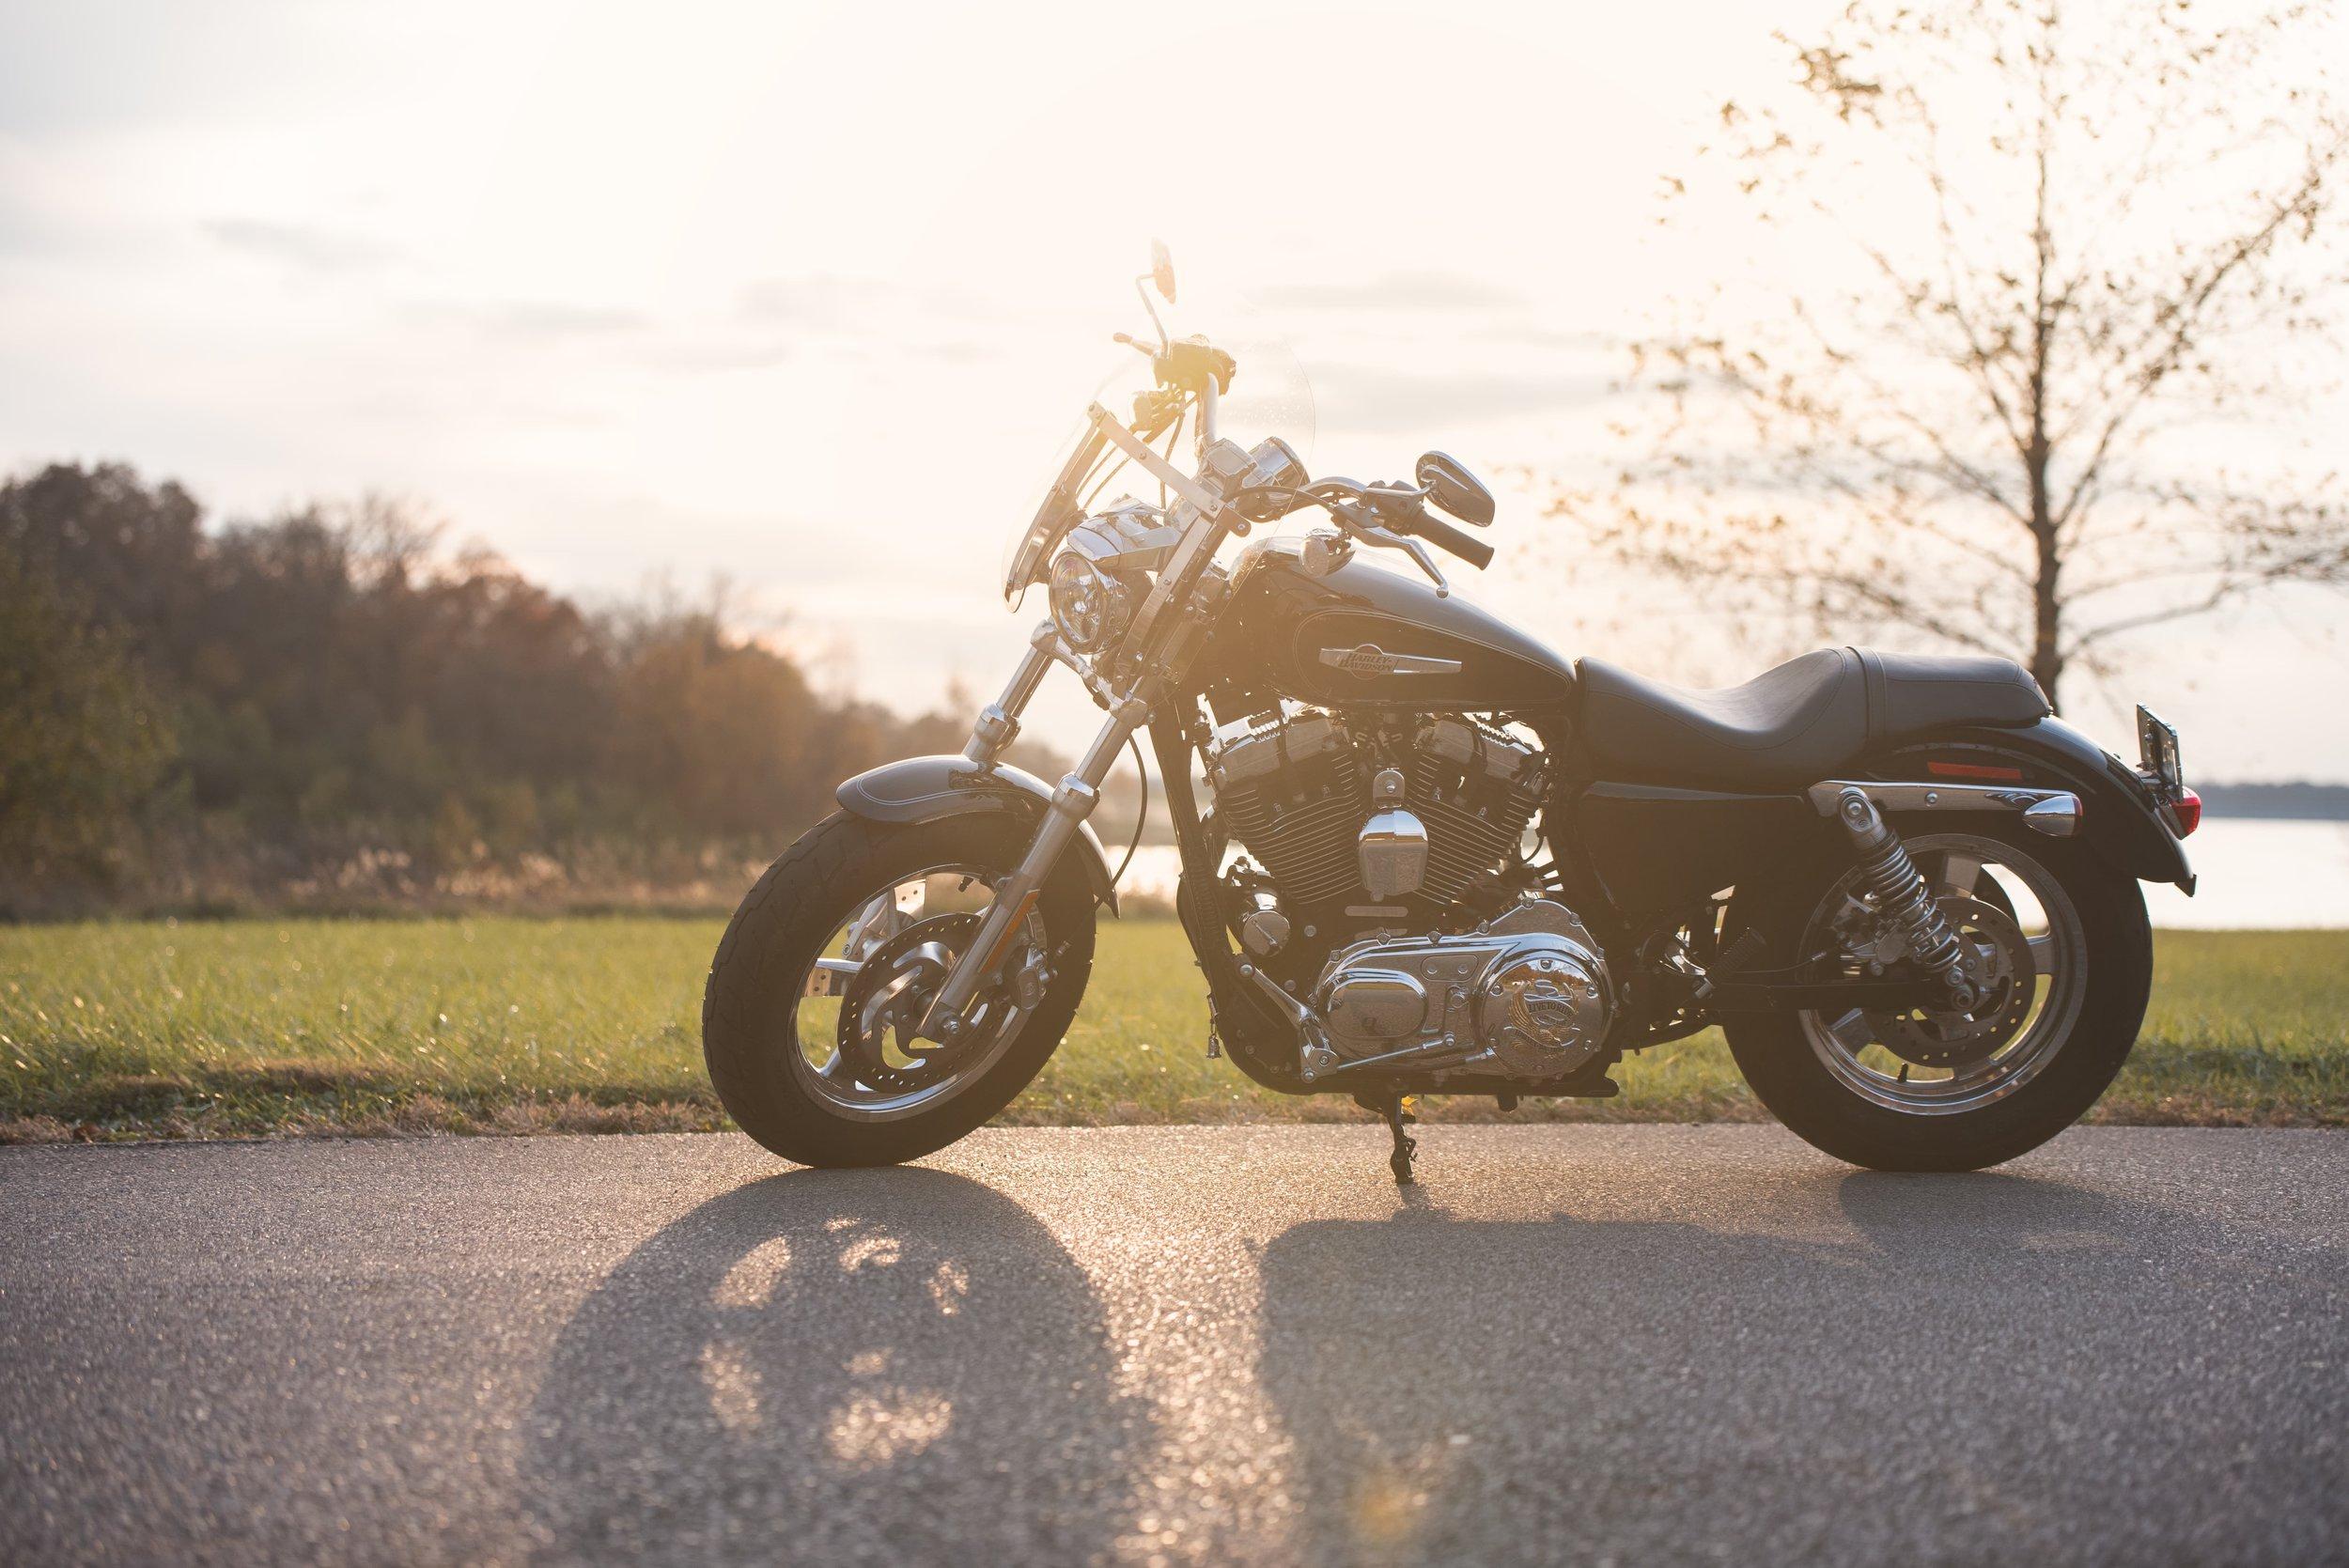 M_Loden_bikes_003.jpg